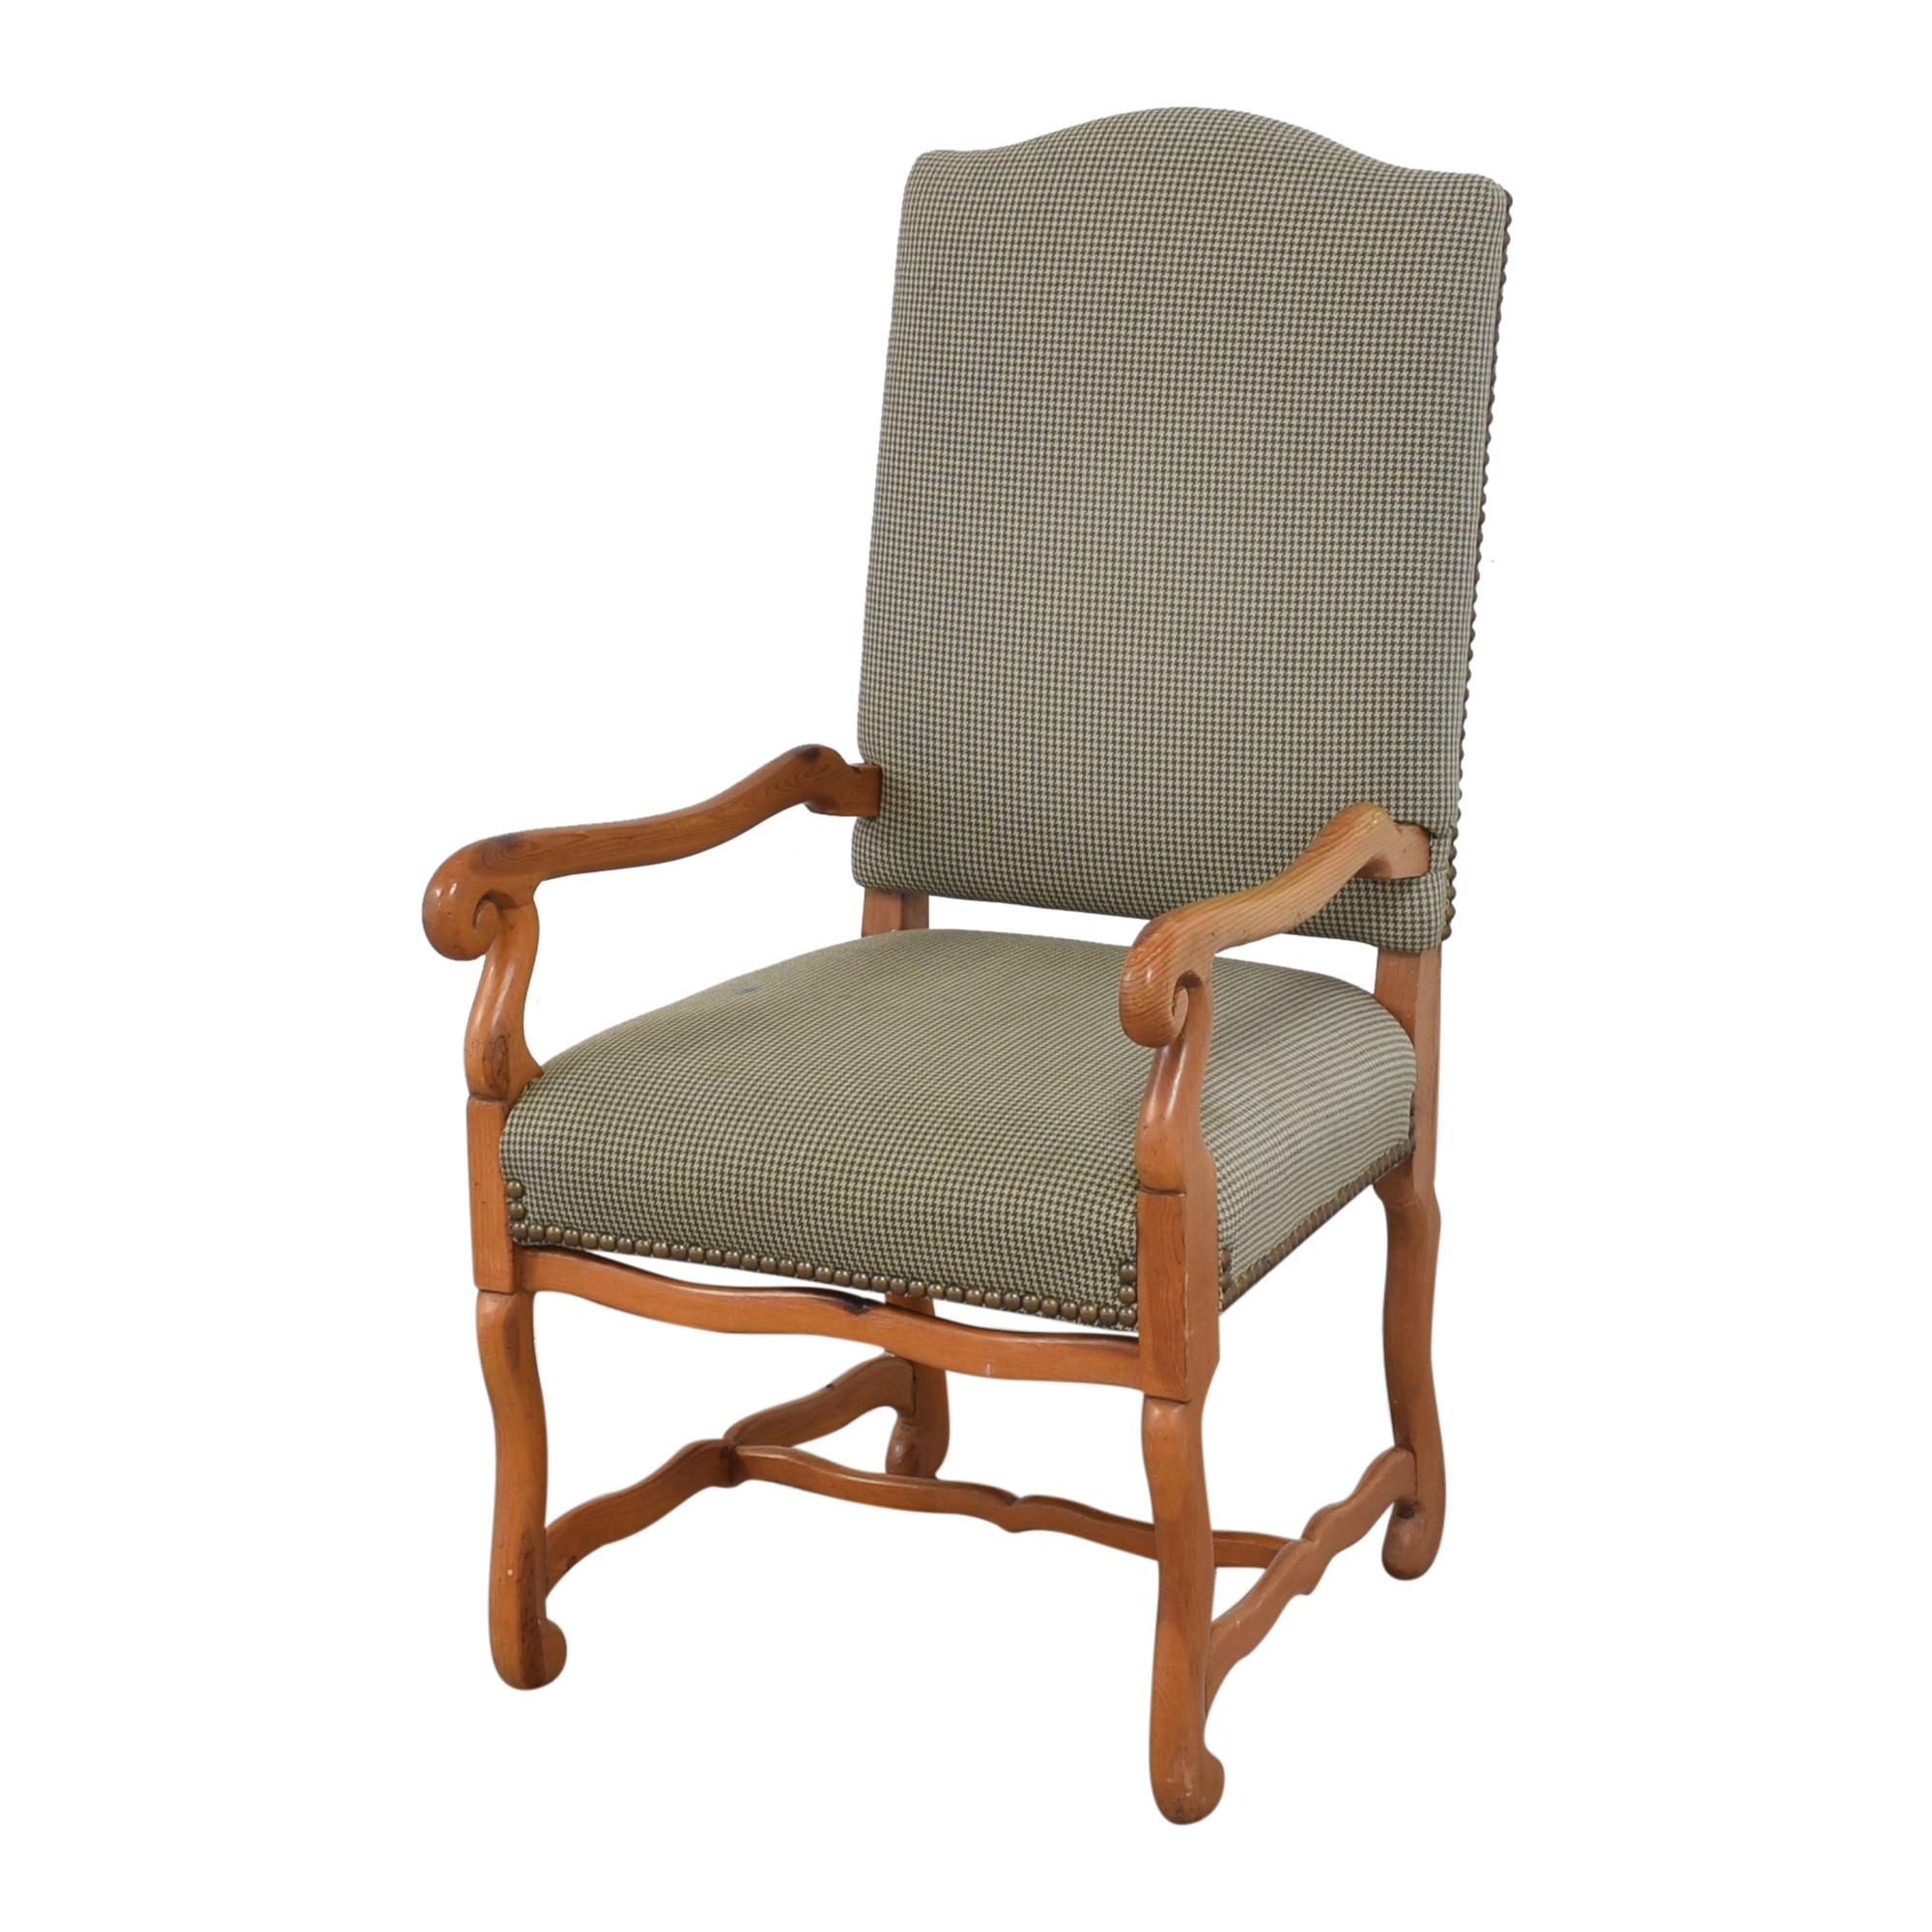 Ralph Lauren Home Ralph Lauren Home Os De Mouton Style Arm Chairs  nyc